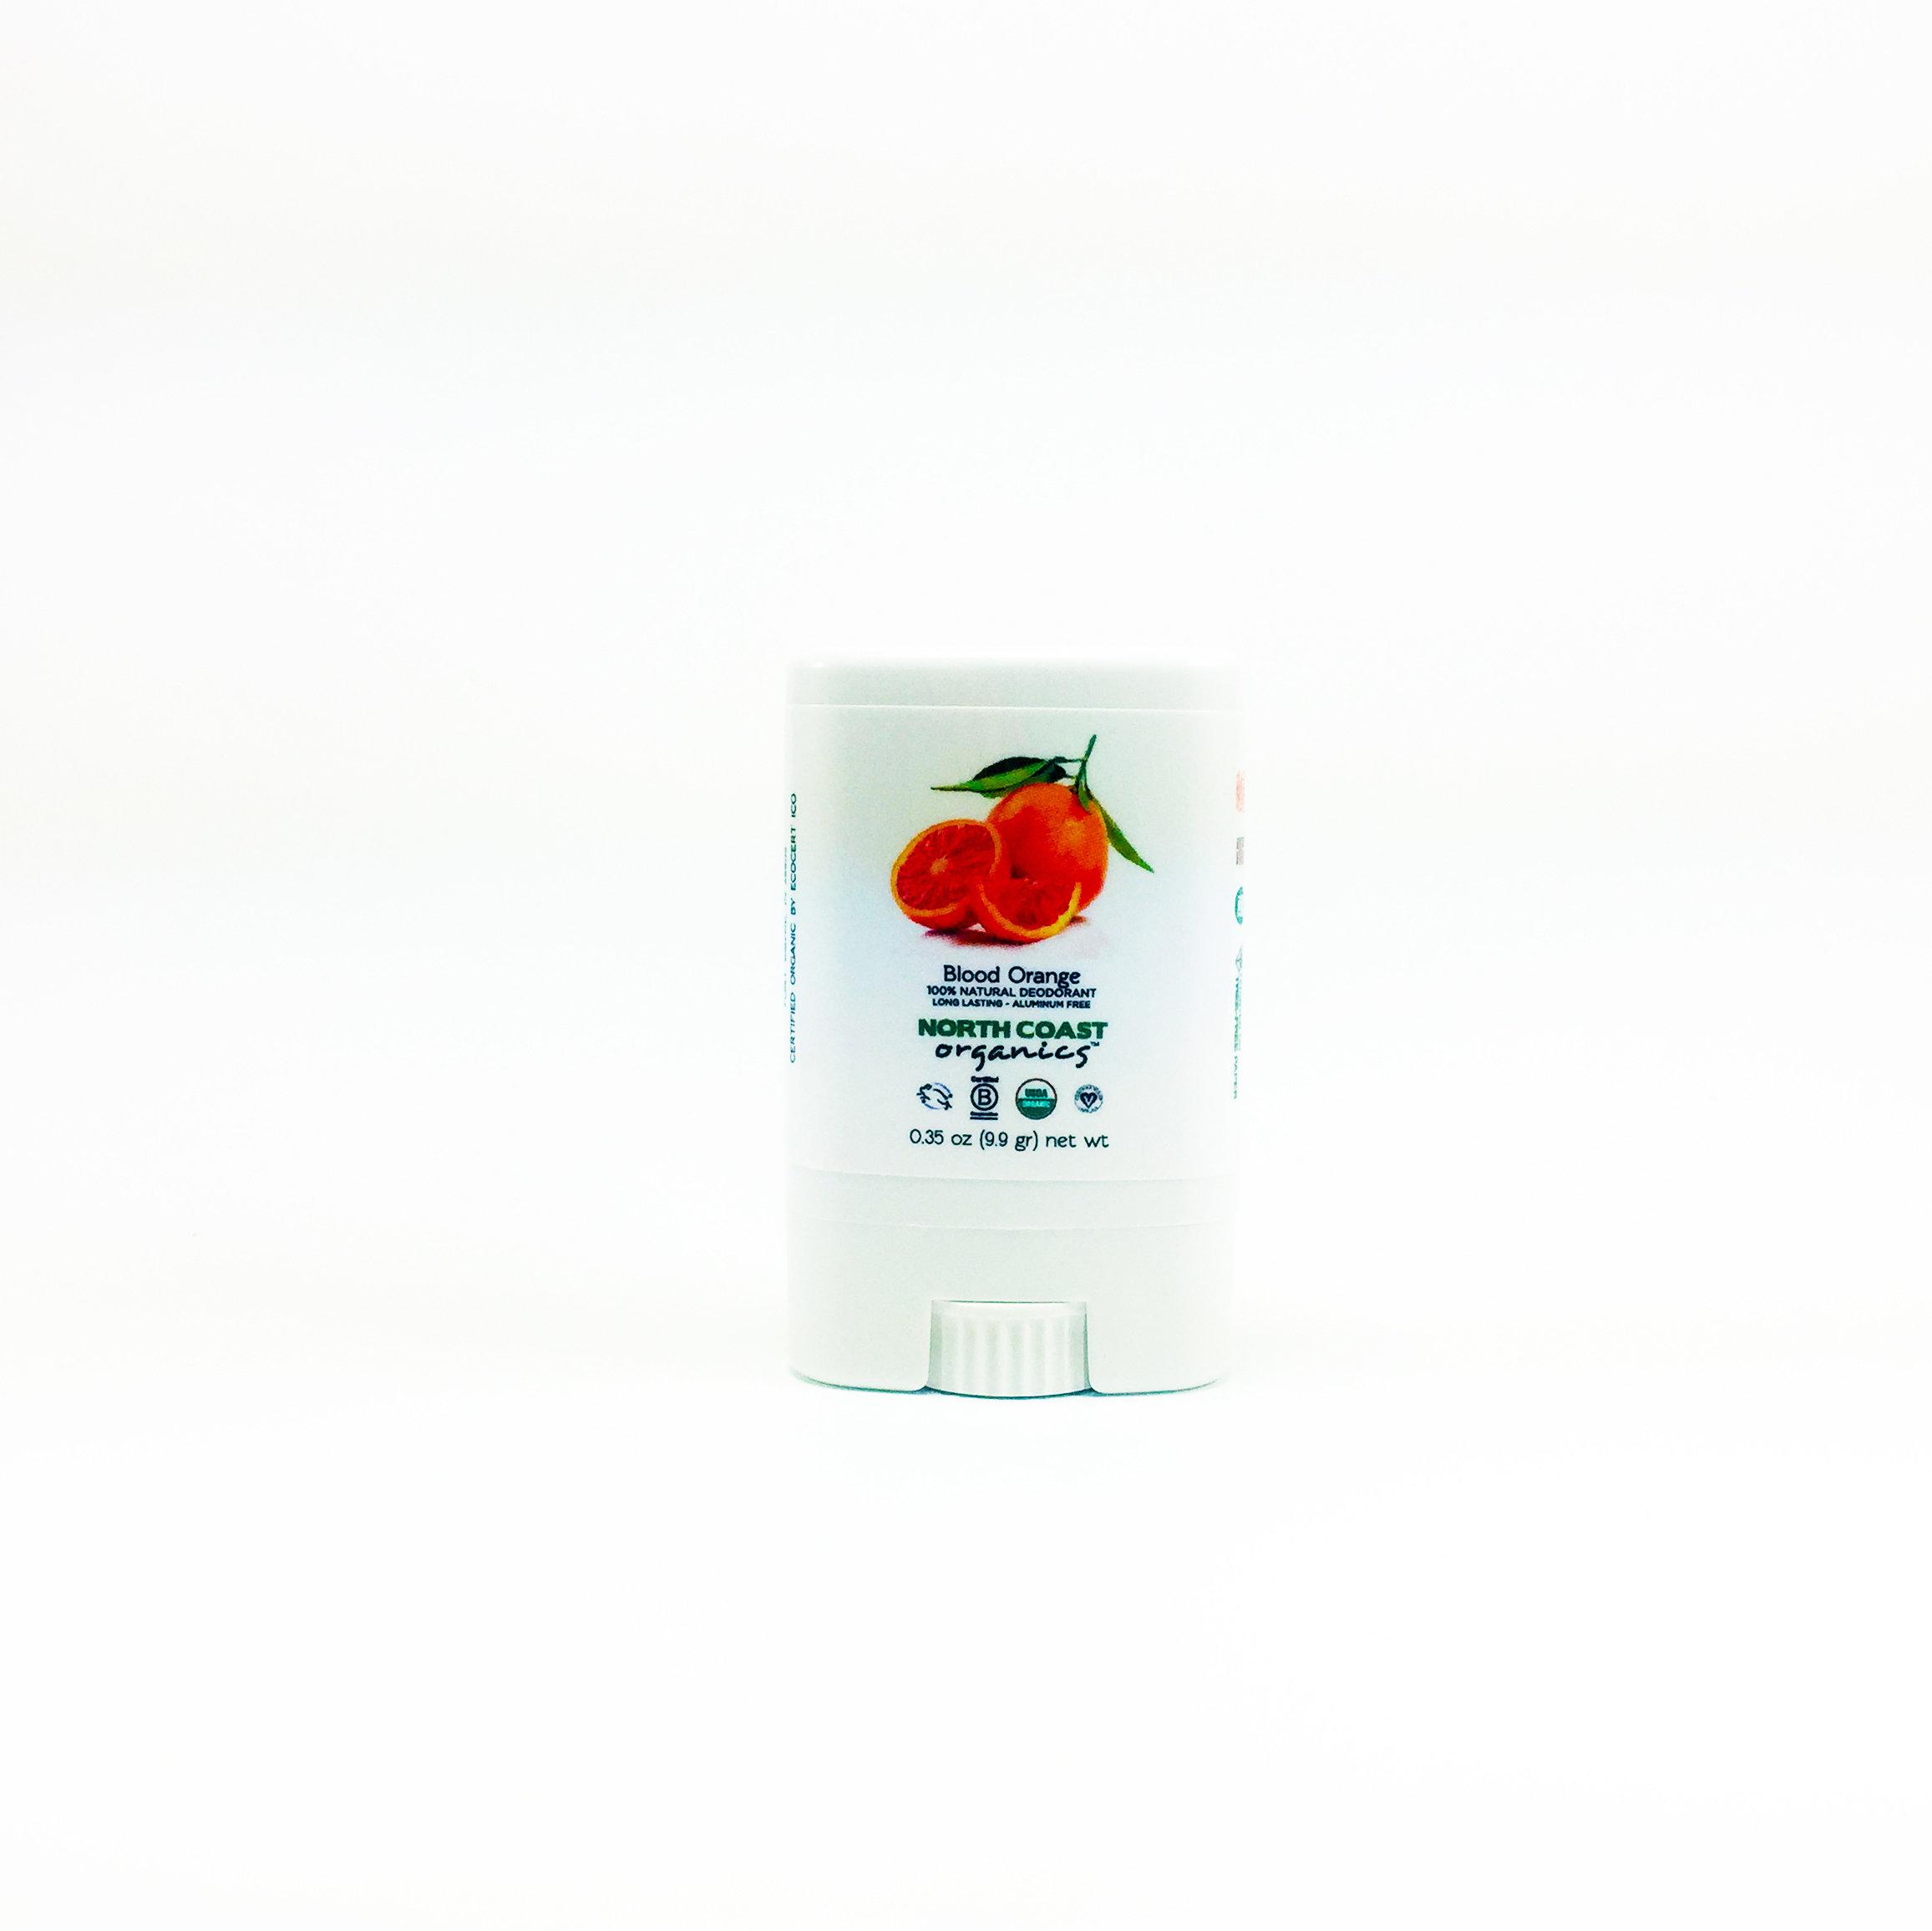 Blood Orange -  Travel Size Organic Deodorant 0.35 oz 2005